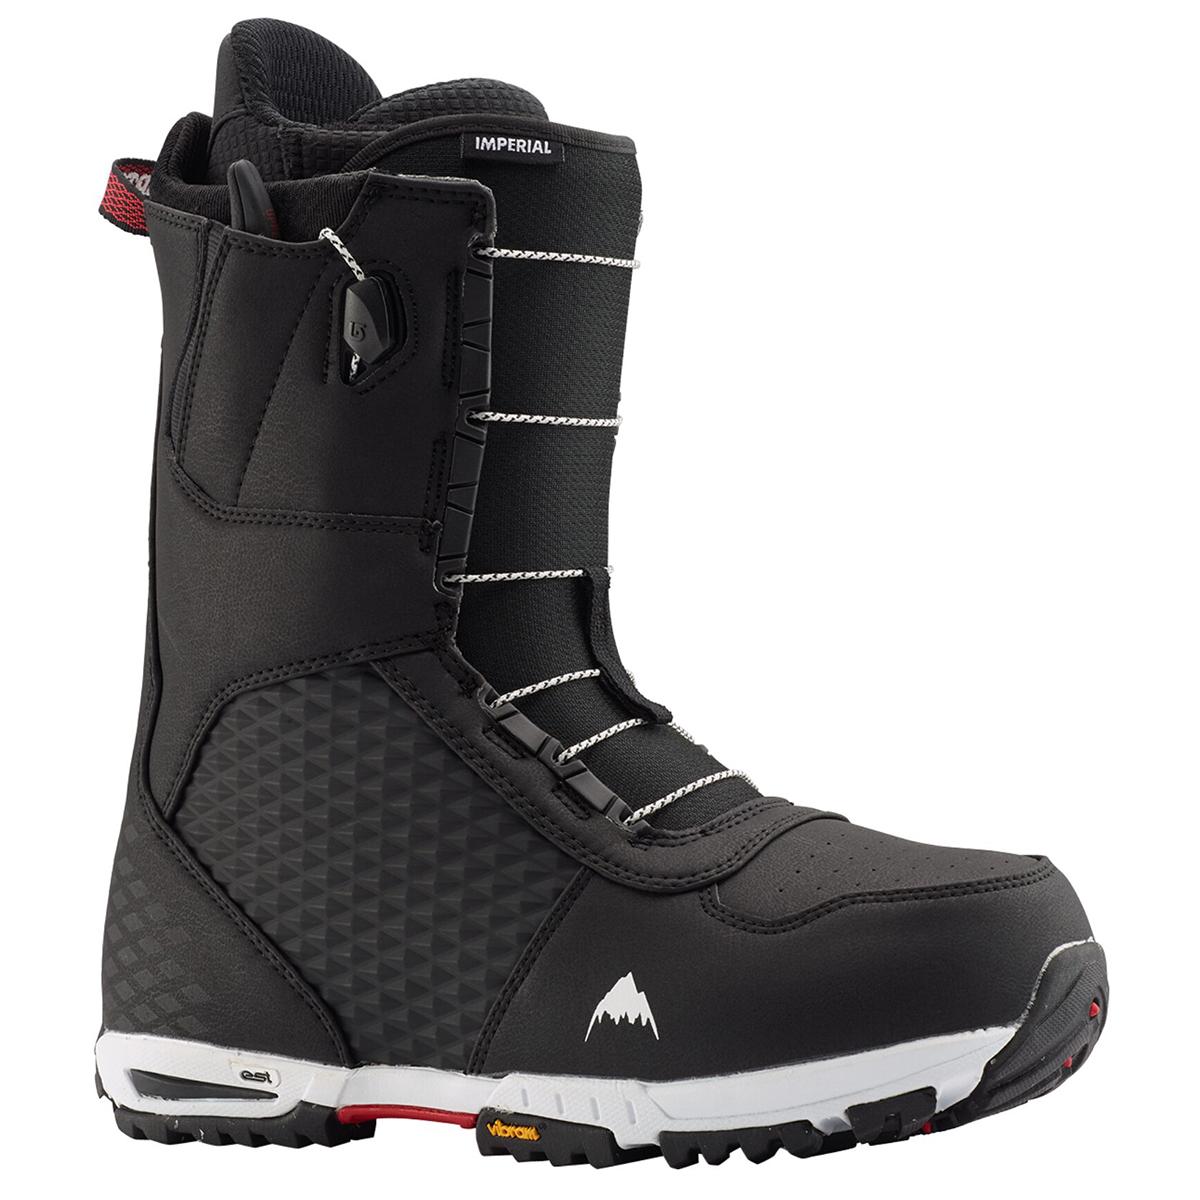 Ботинки для сноуборда Burton Imperial 2020, black, 30